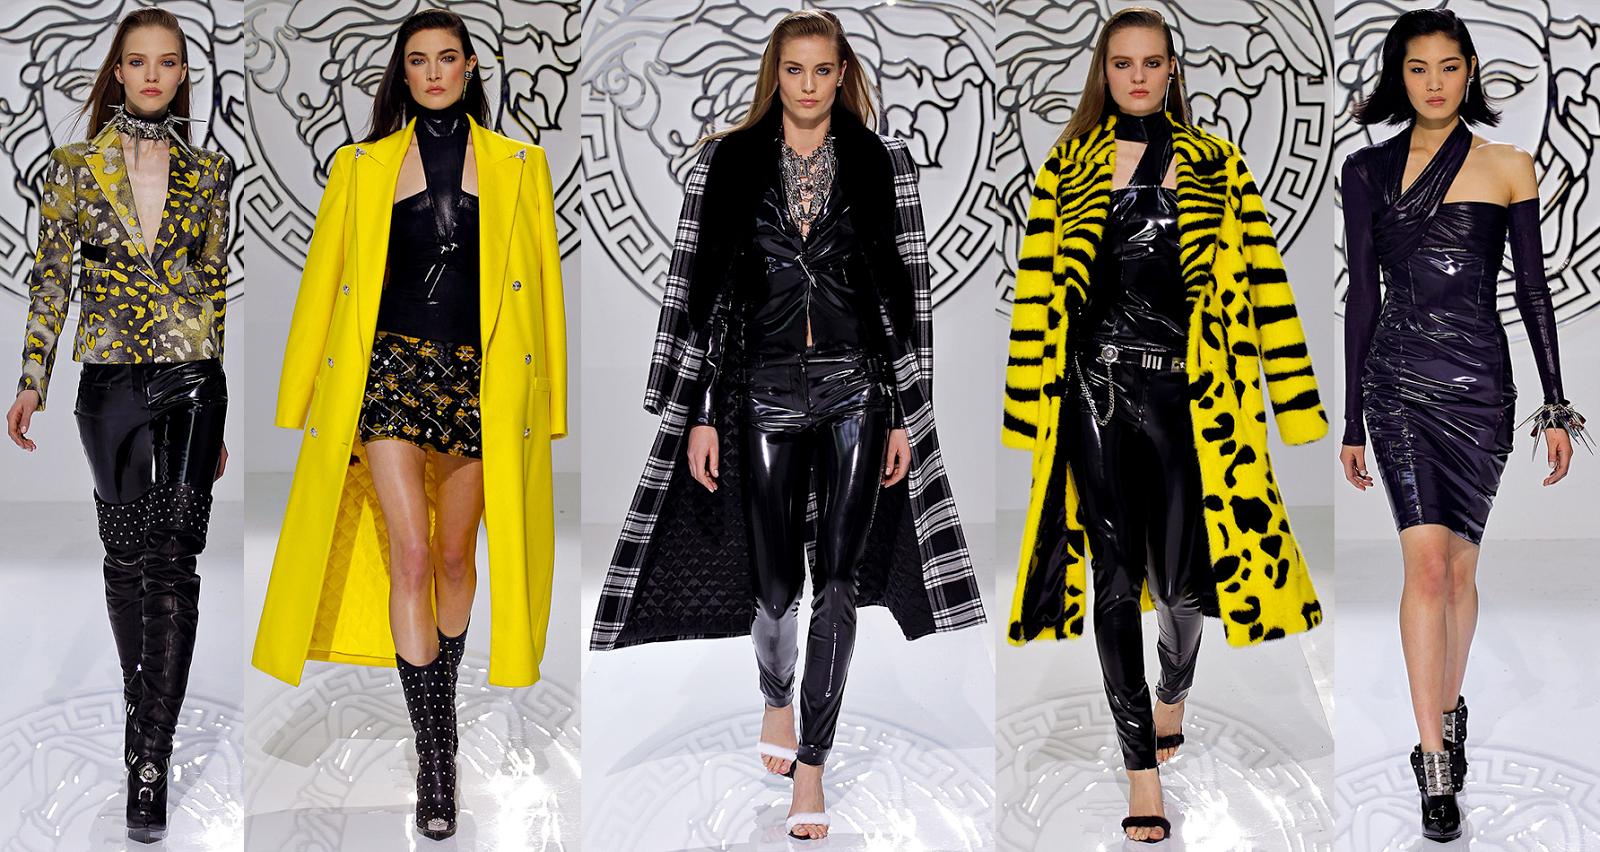 Donatella Versace Design